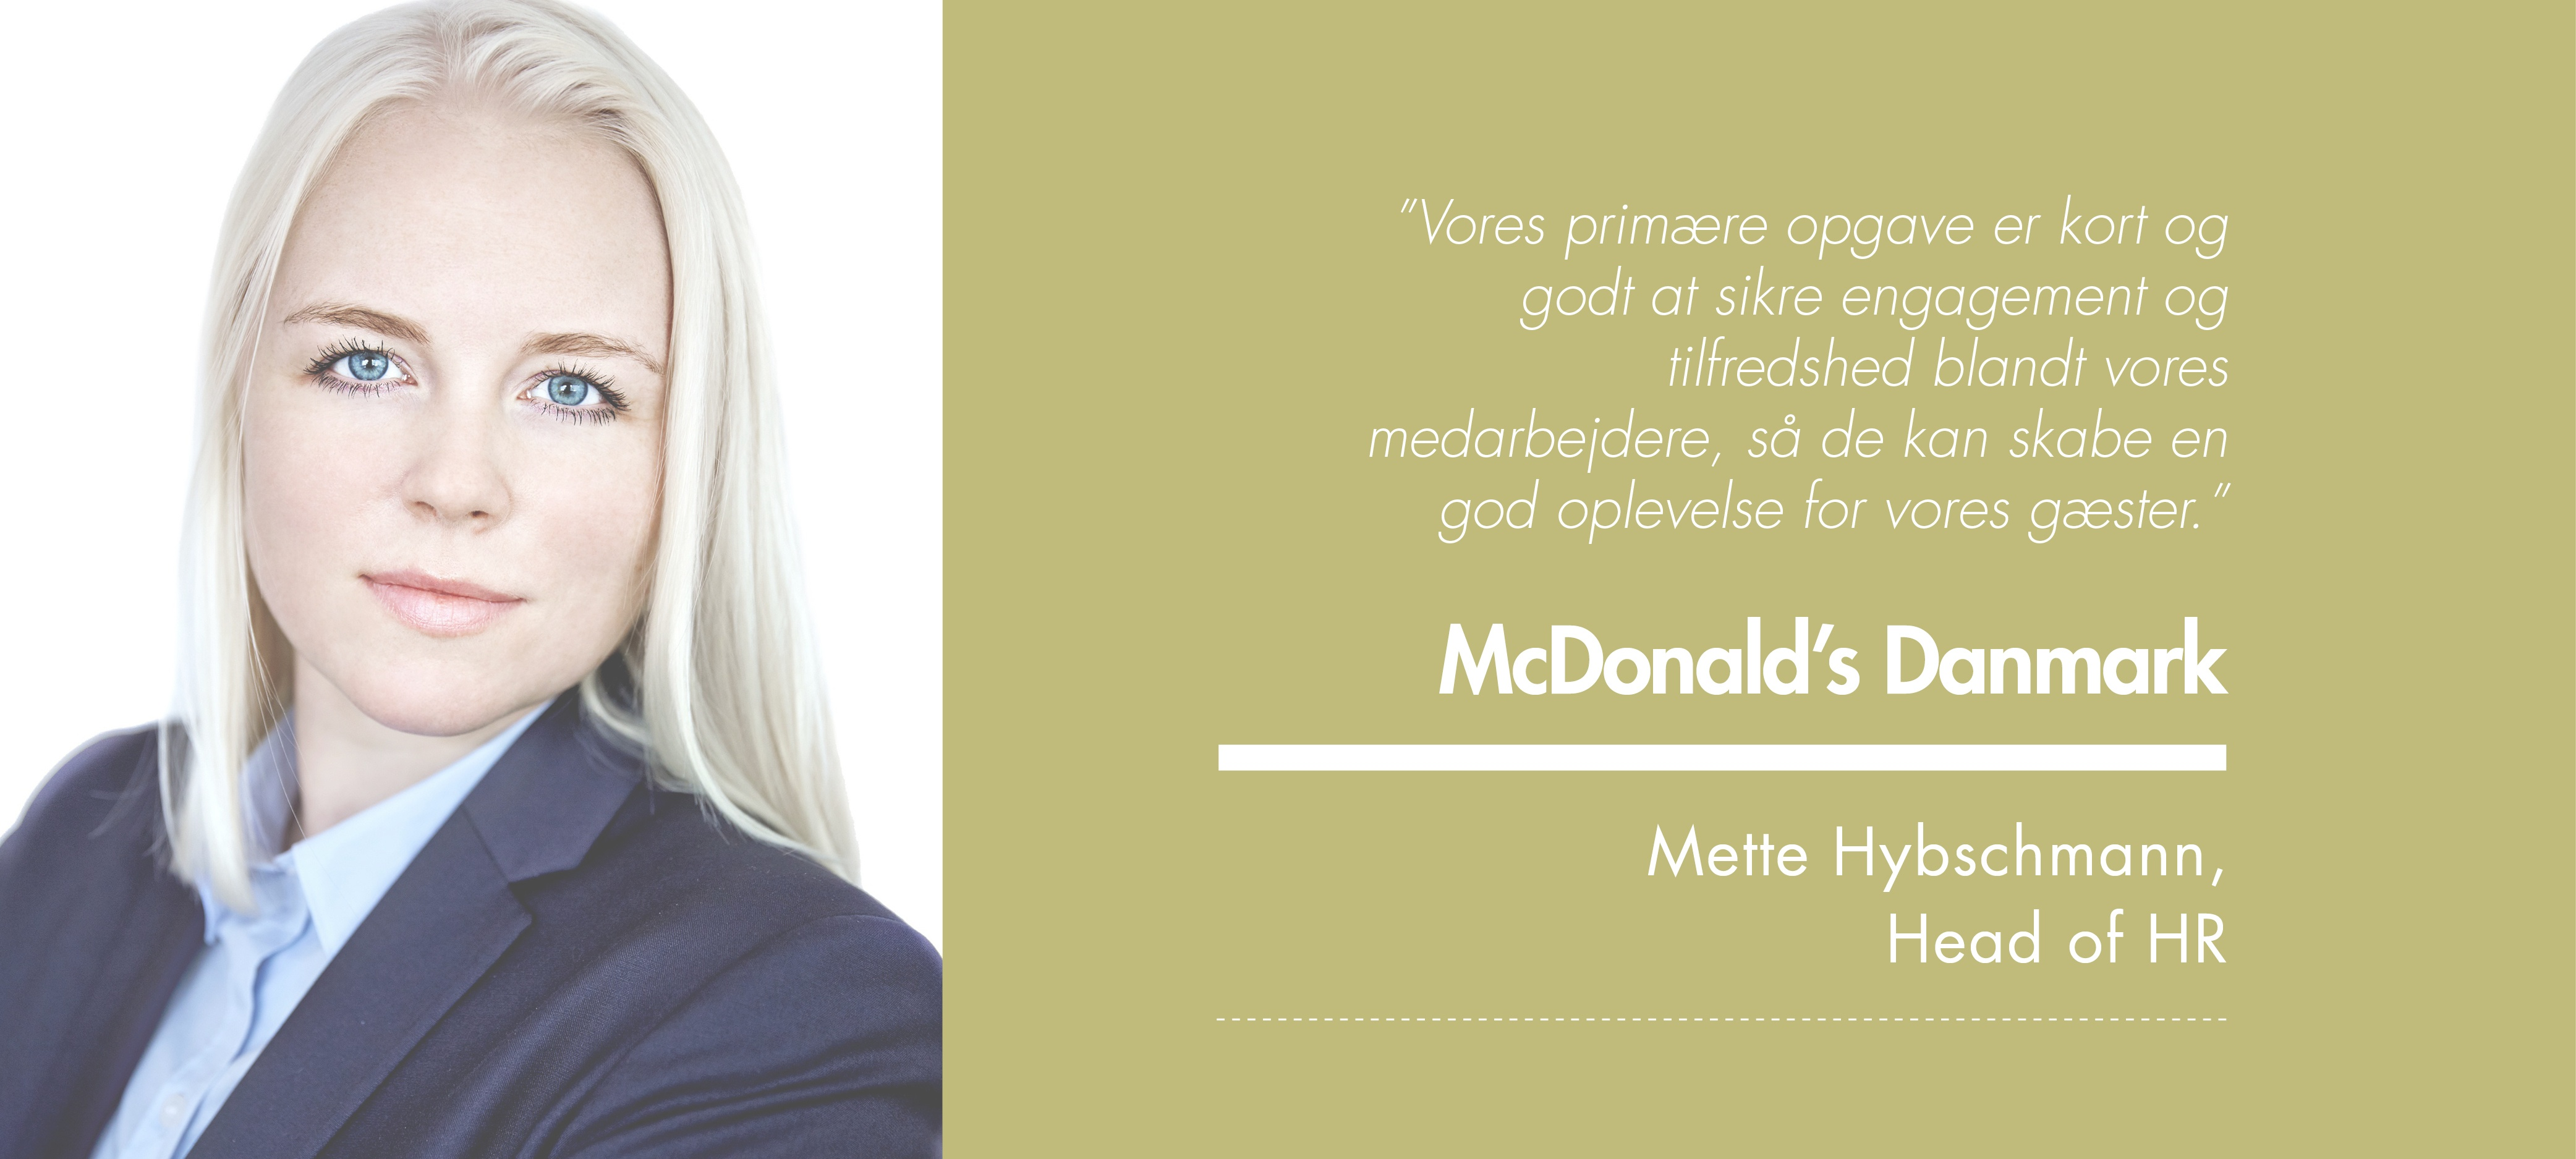 Velkommen til McDonald's – vi er nu digitale